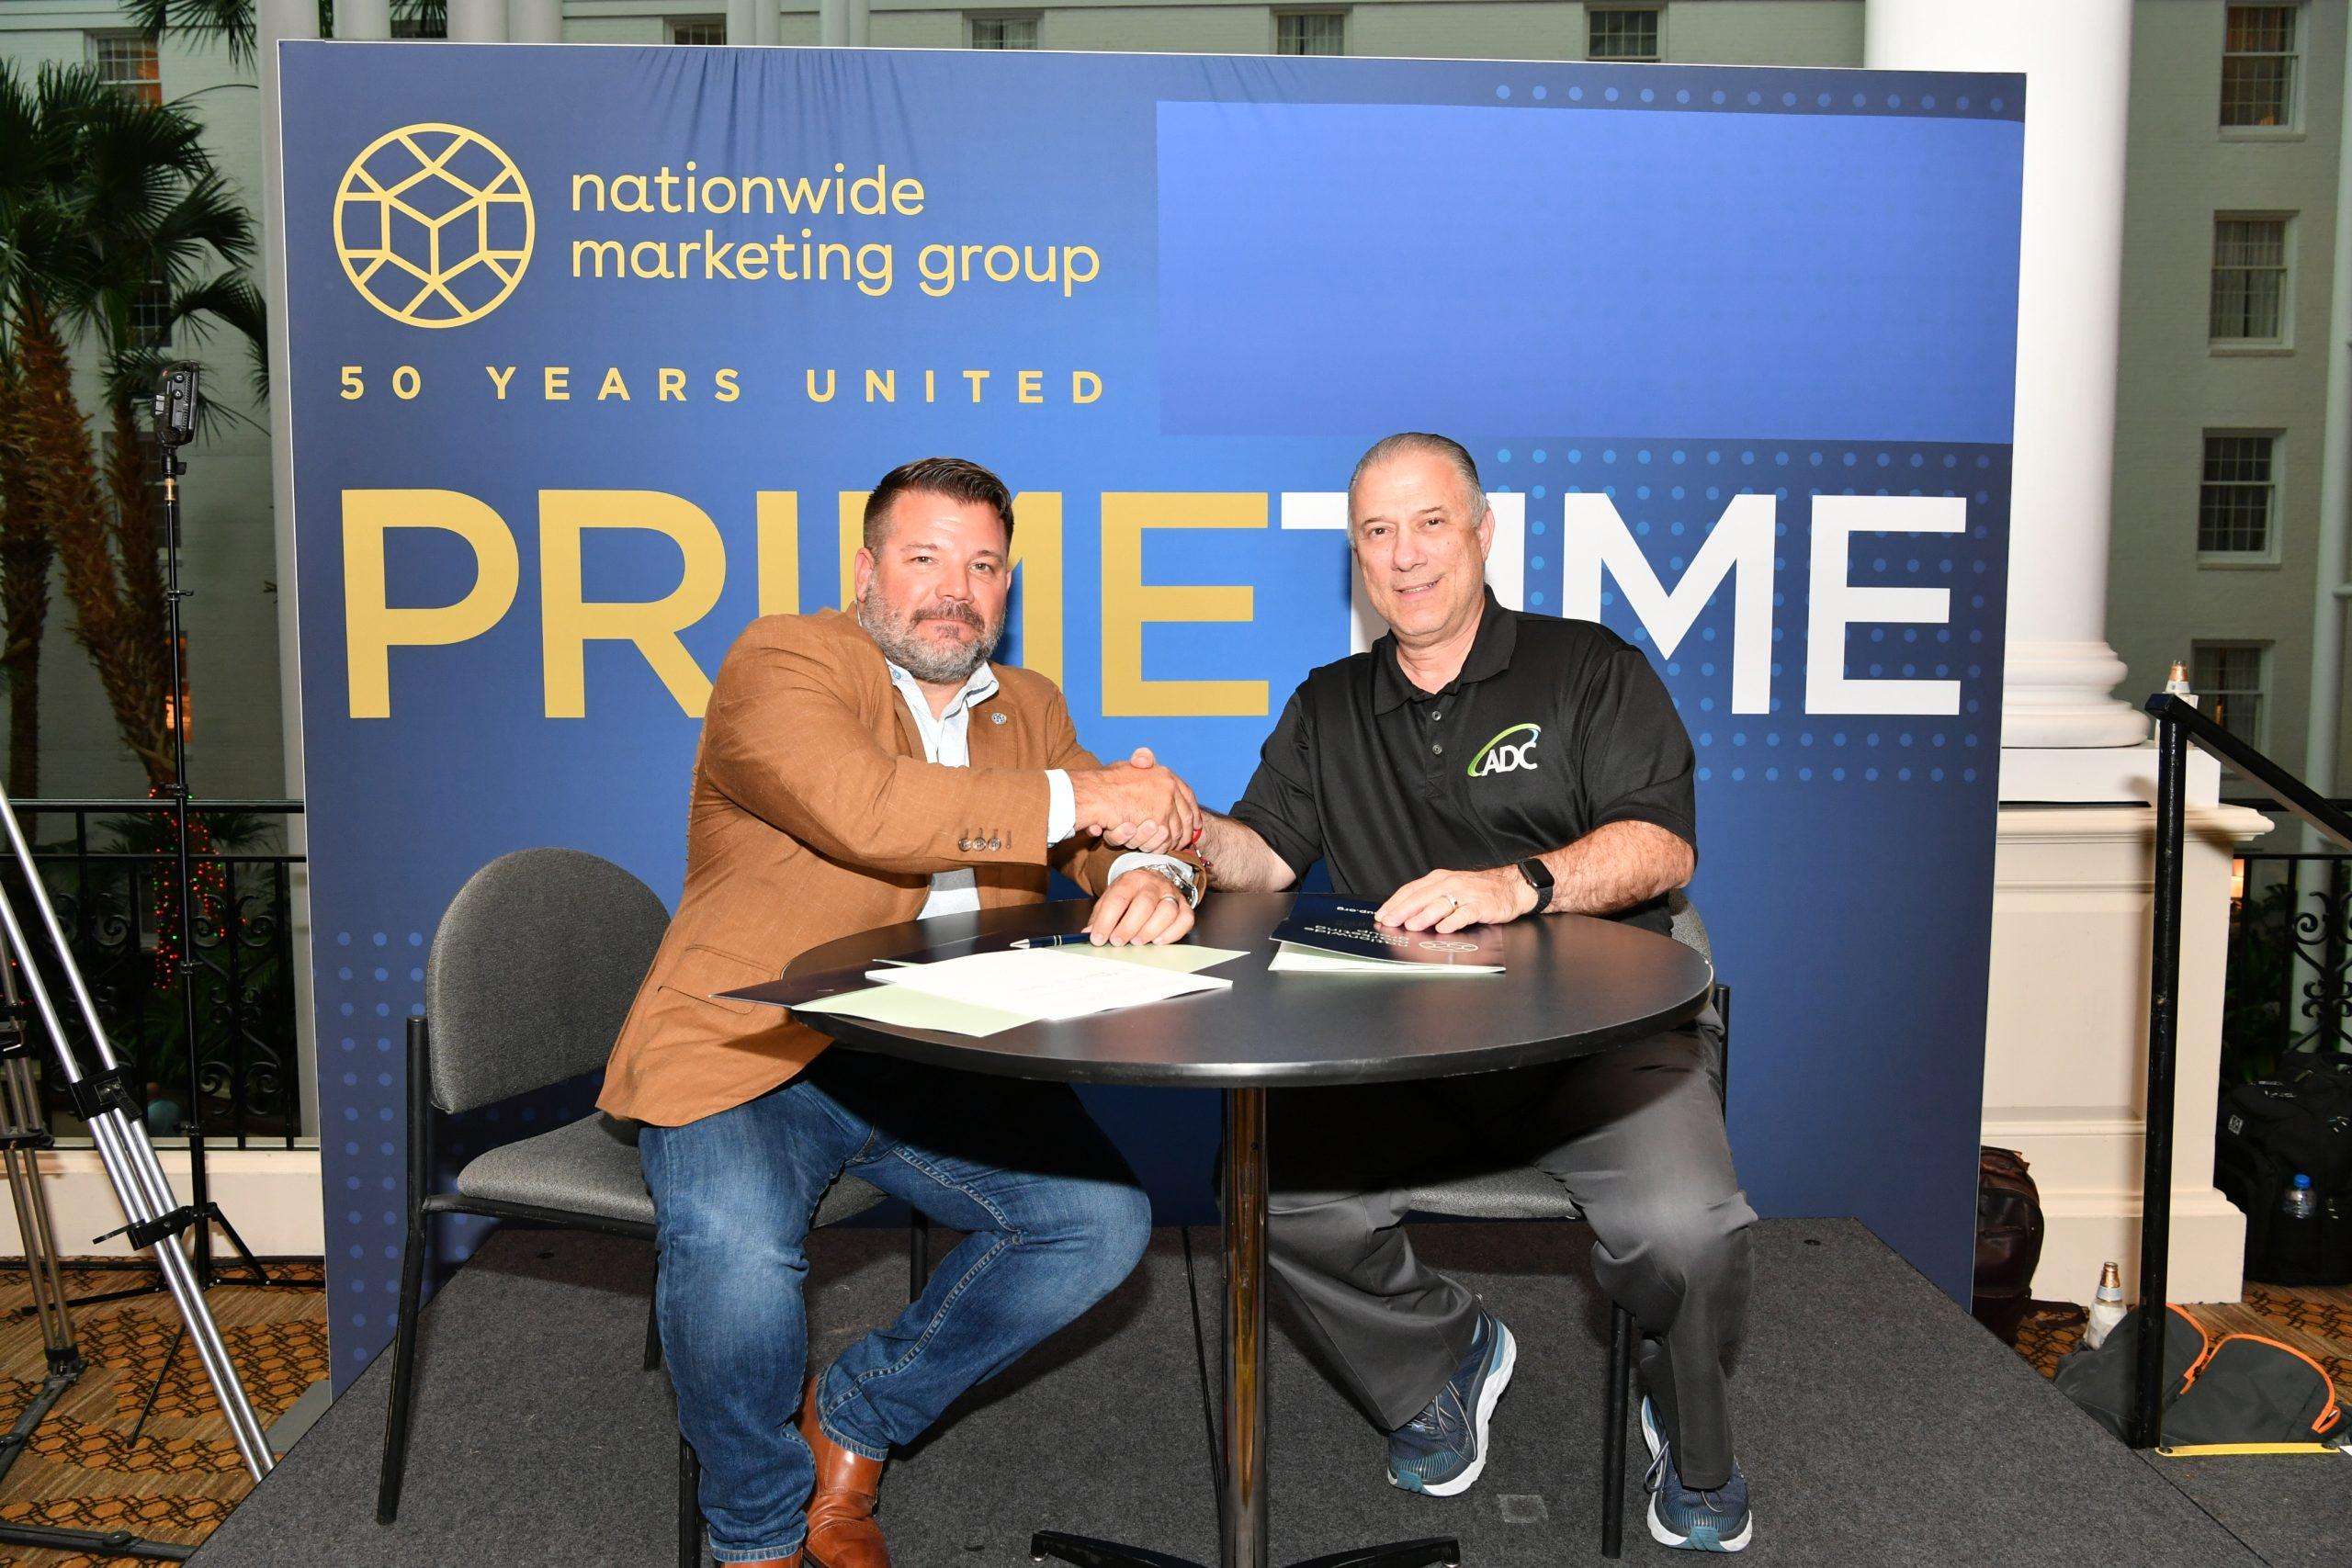 Nationwide Marketing Group ADC